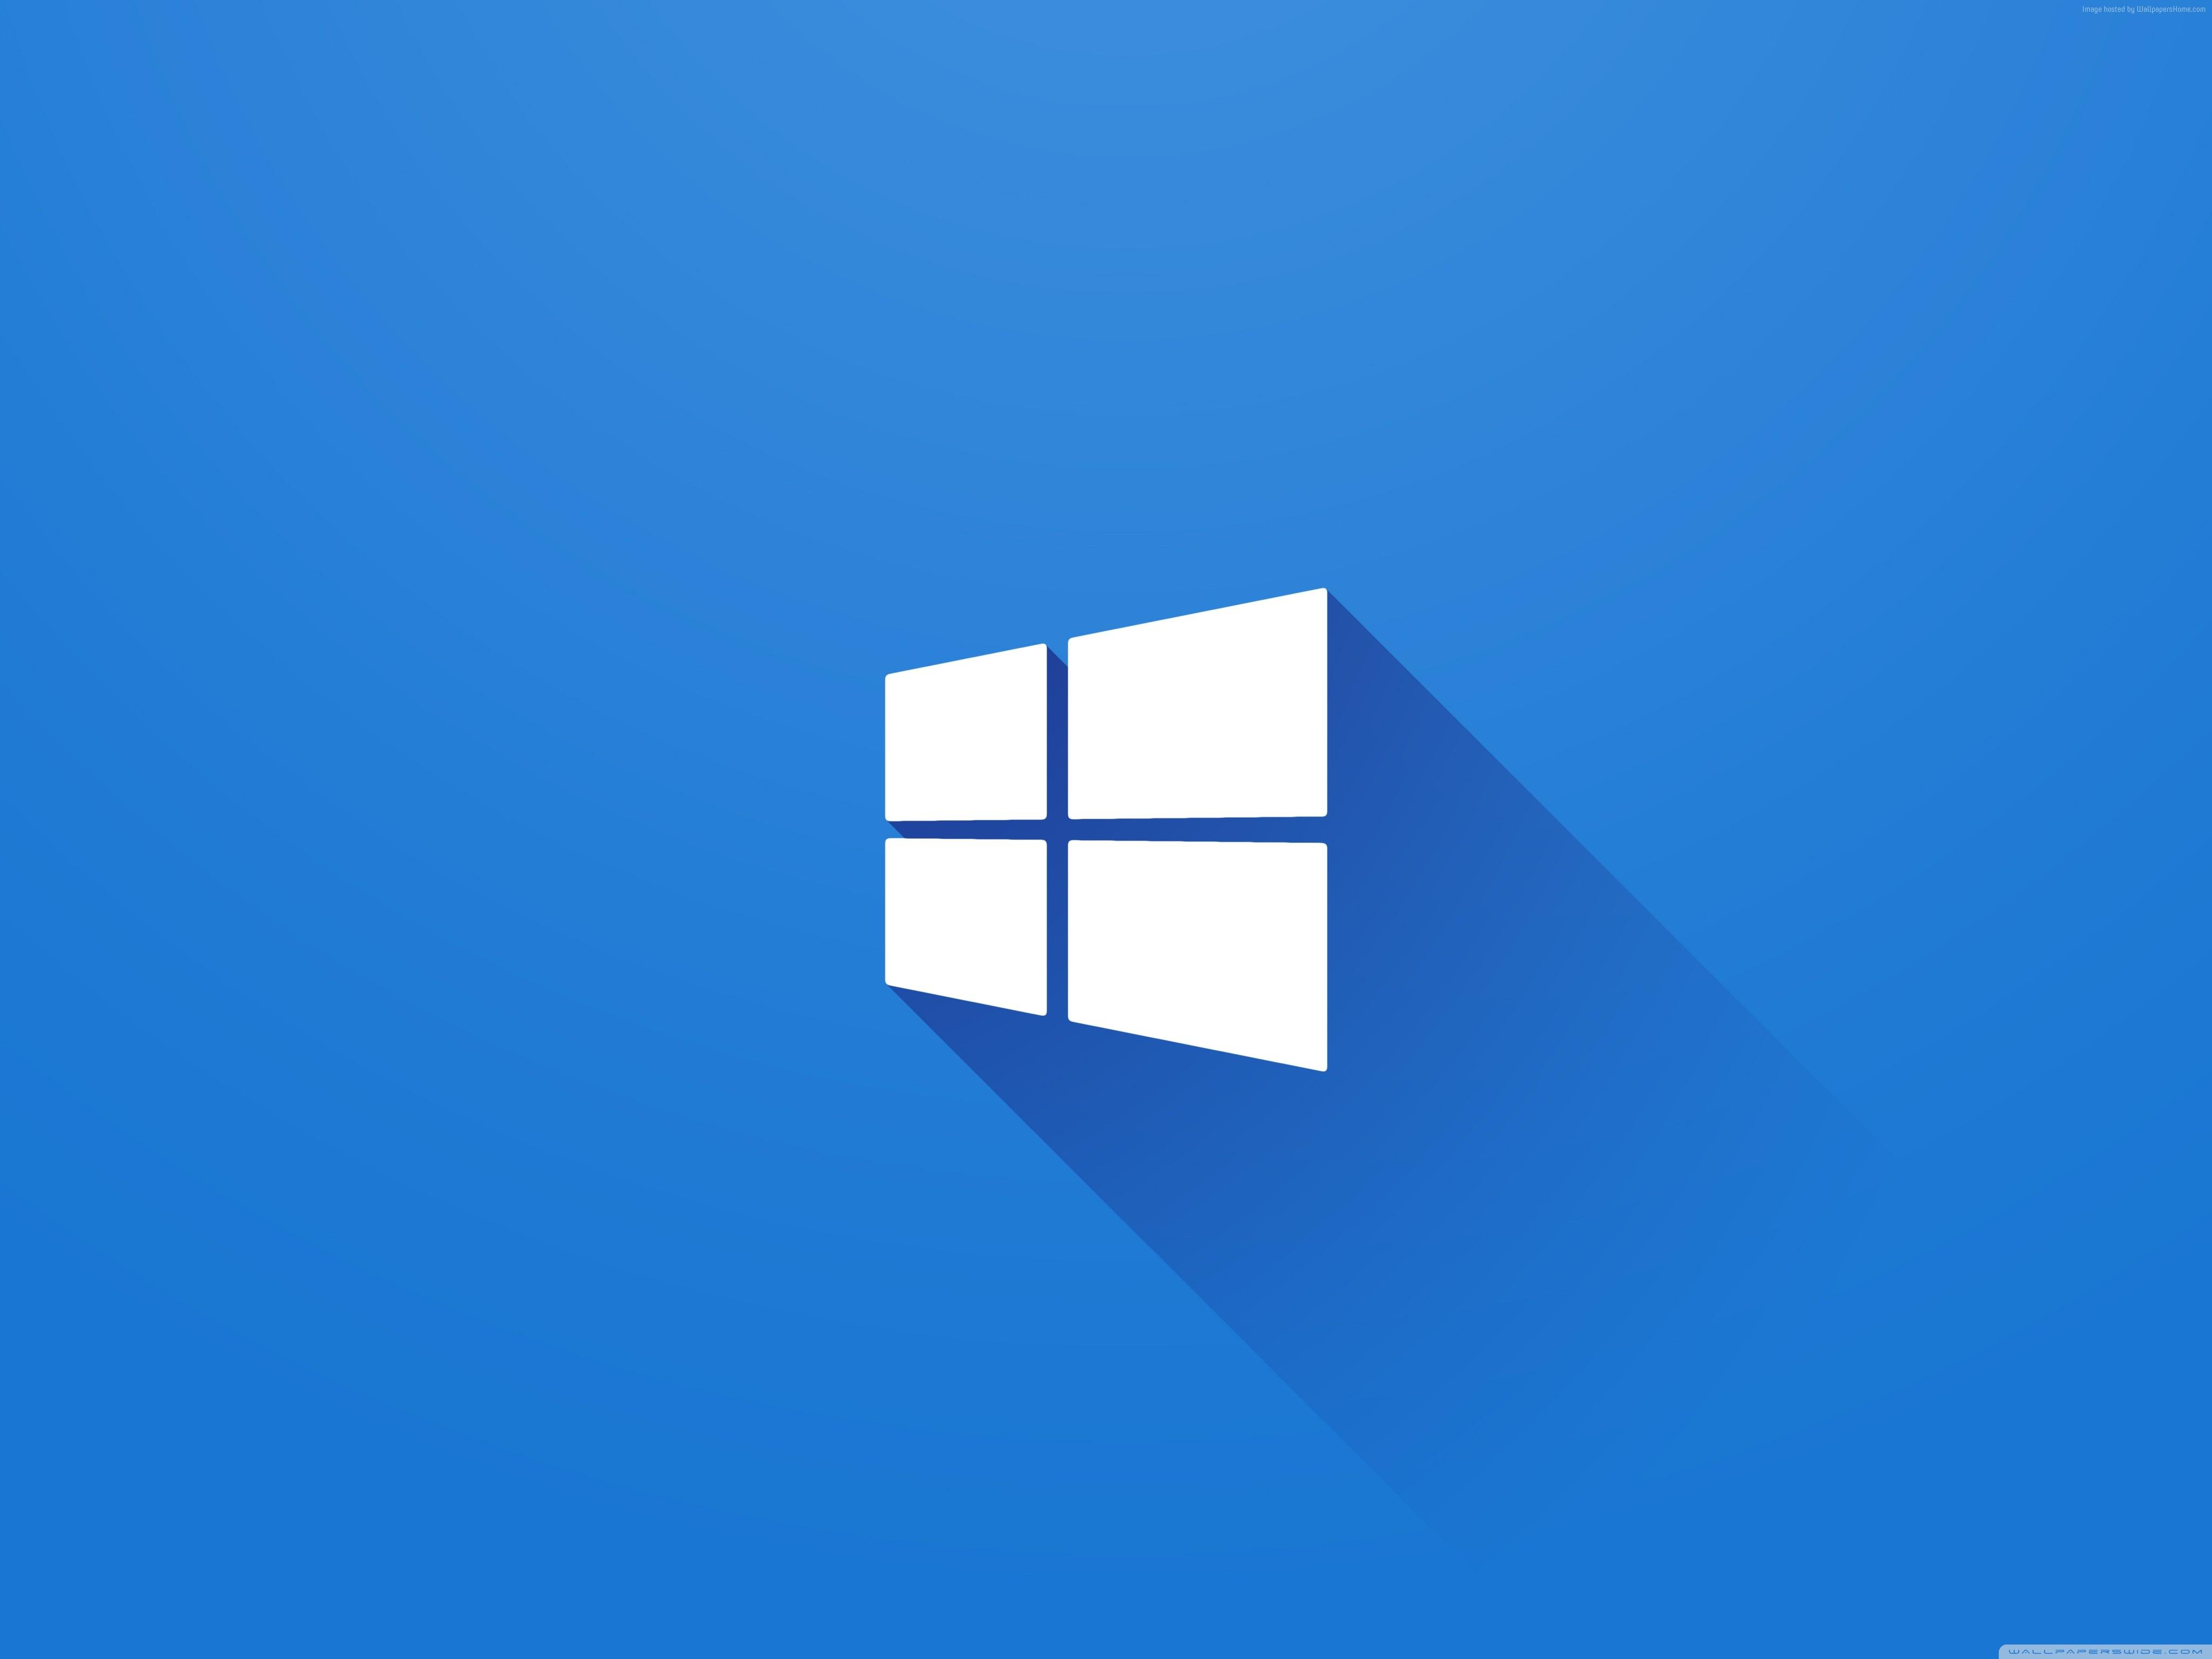 Wallpaper download microsoft - Windows 10 Wallpaper Os Recent Windows 10 Microsoft Blue